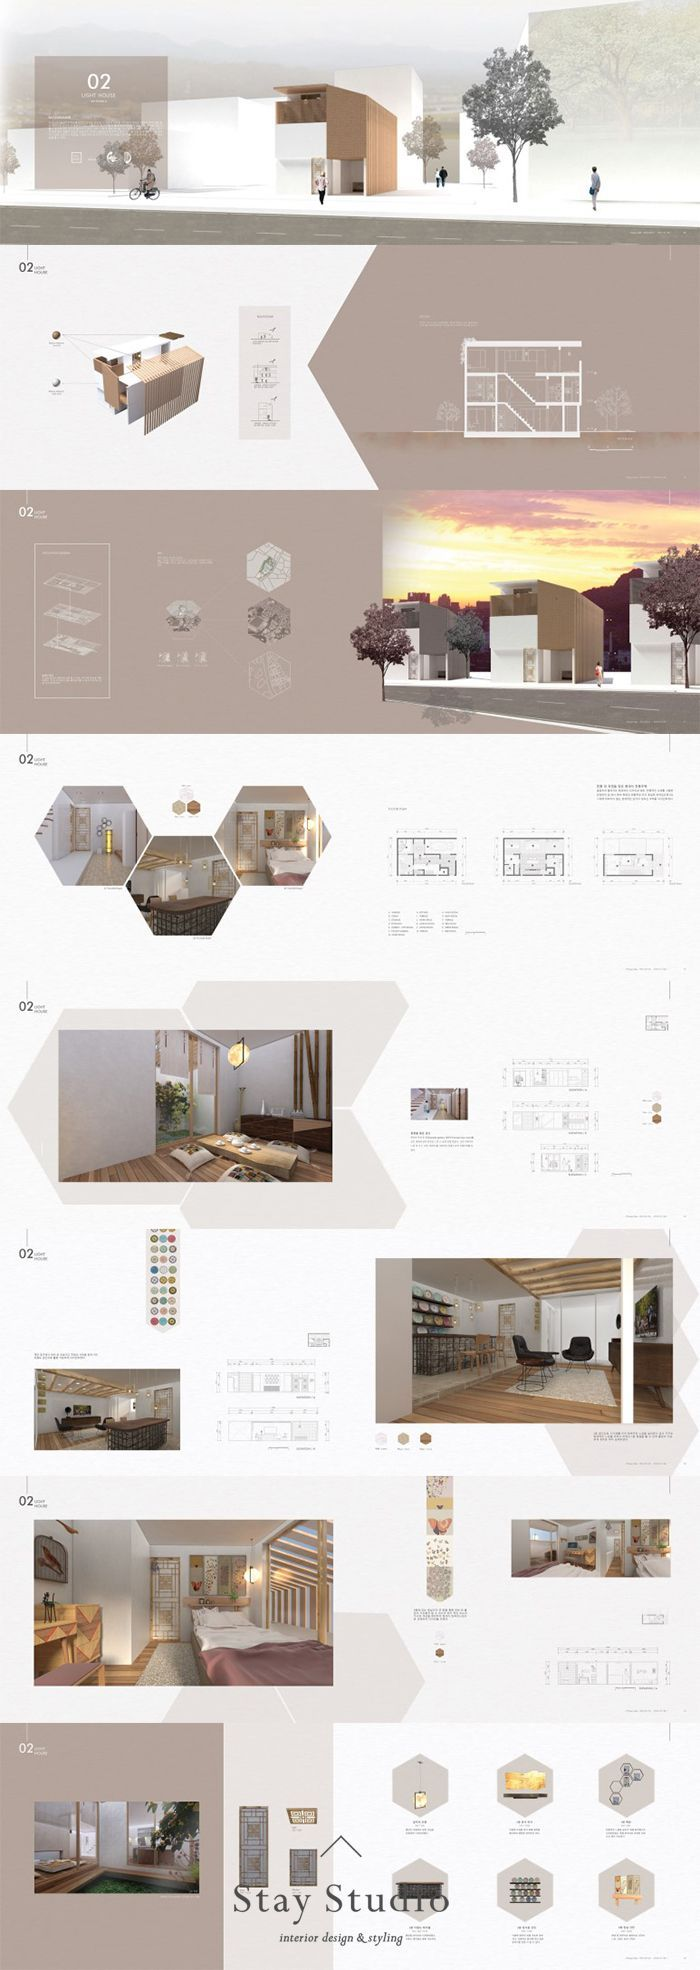 Stay Studio] Interieur Portfolio Interieur Portfolio / Hausdesign ...